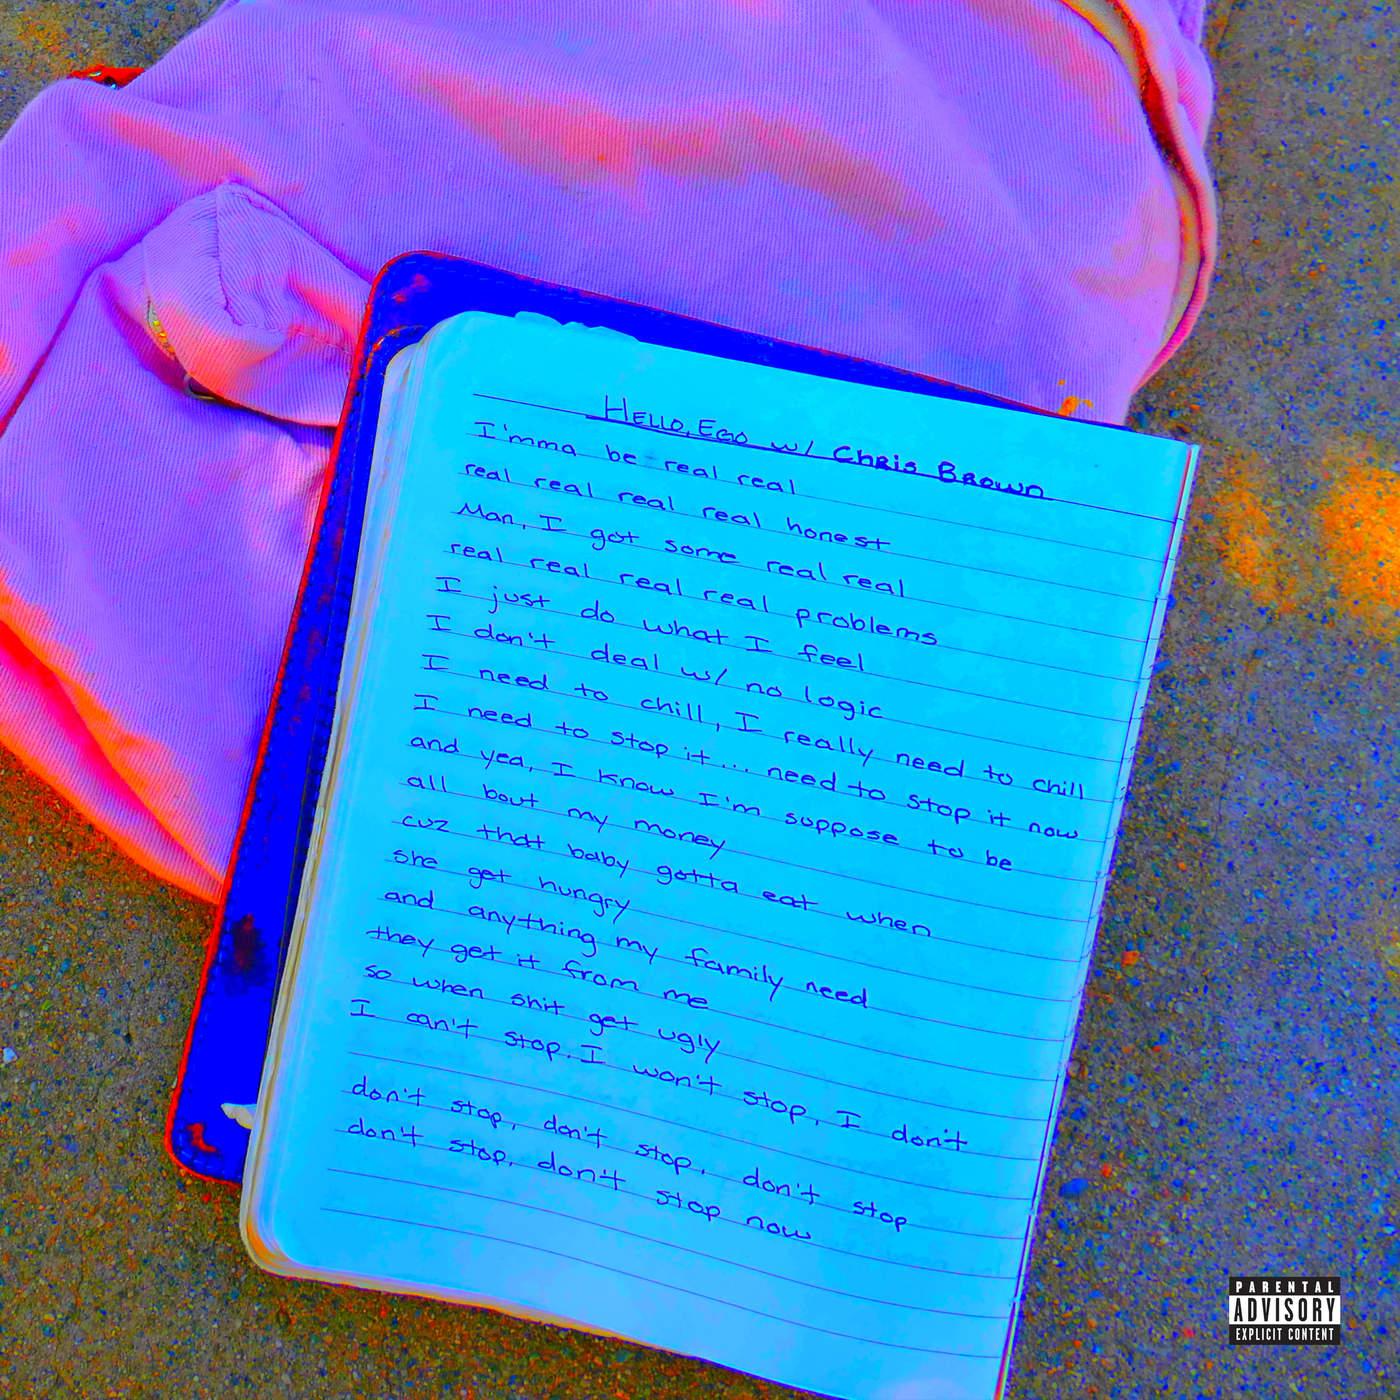 Jhené Aiko - Hello Ego (feat. Chris Brown) - Single Cover